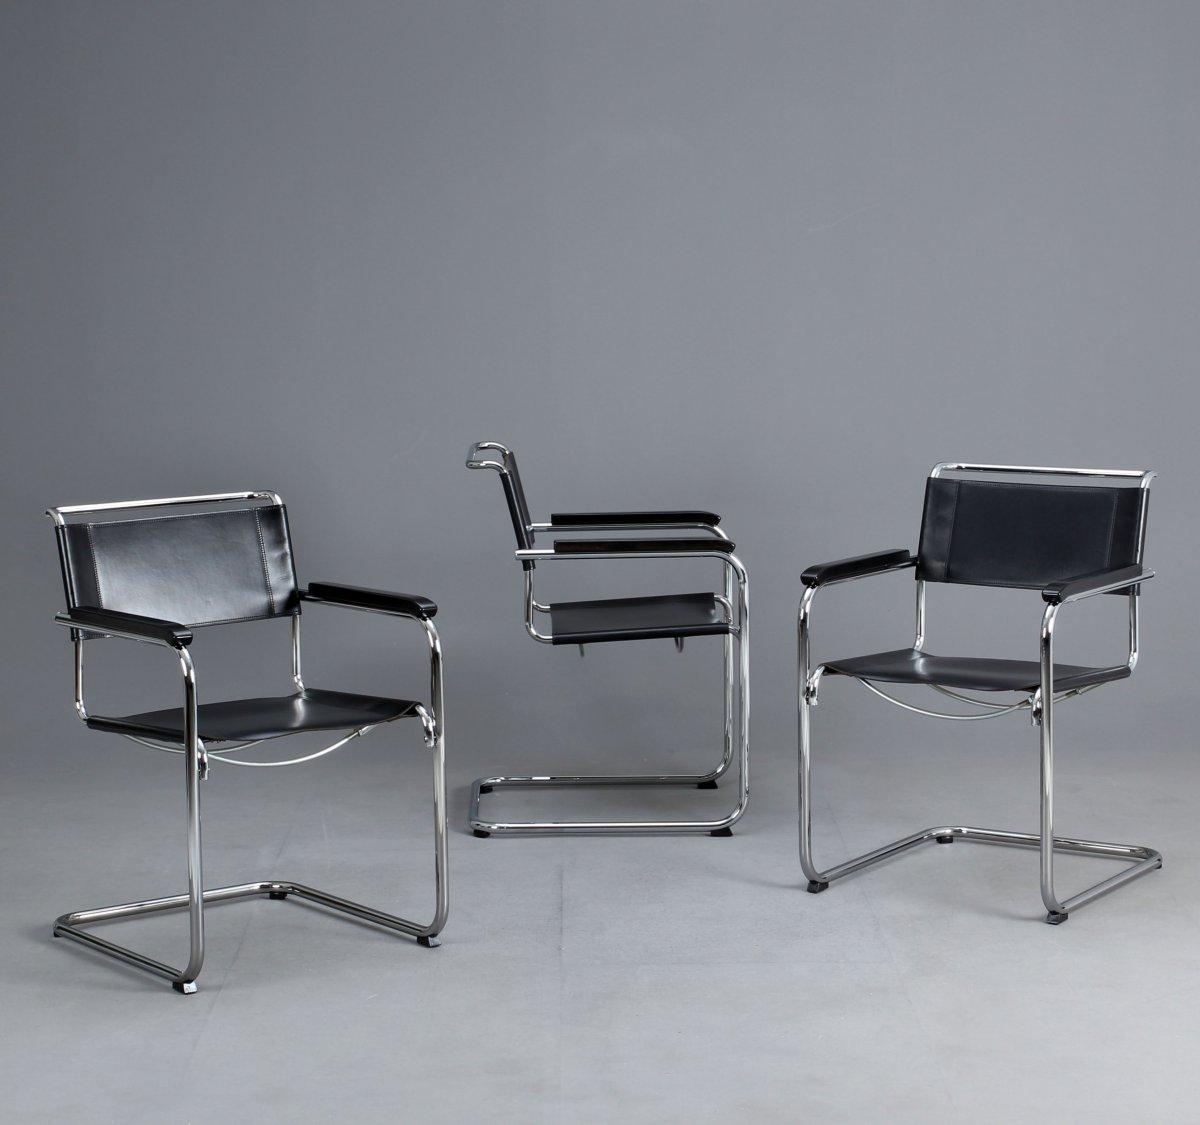 Original vitra panton chair classic 2013 stuhl aus hartschaum rot hochglanz ebay - Panton stuhl original ...